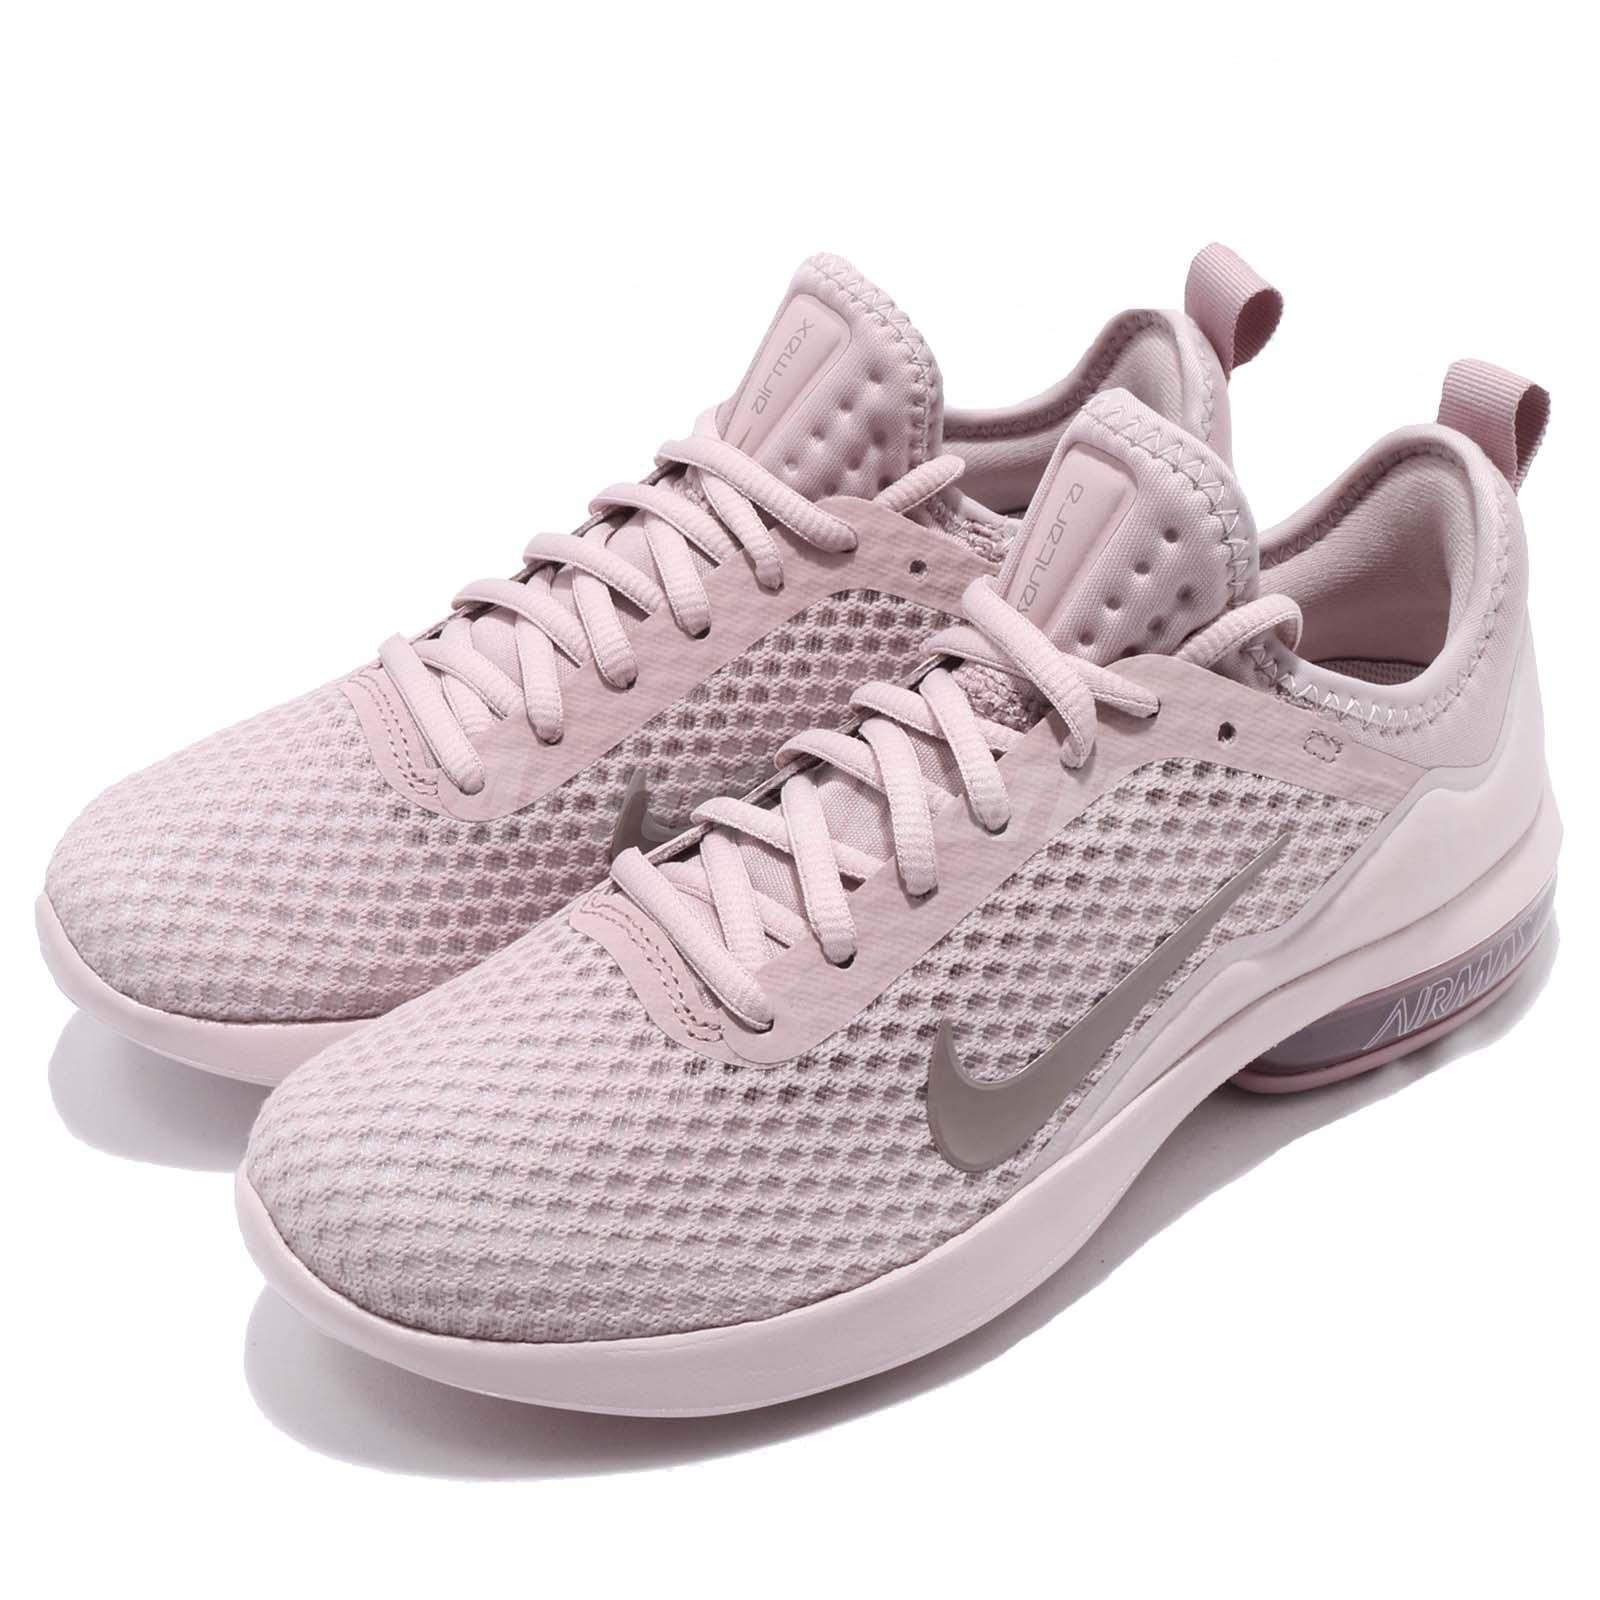 buy popular 1efe9 a02fa Nike Wmns Air Max Kantara Particle Rose Mujer running Shoes 908992-601  Sneakers 908992-601 Shoes el mas popular de zapatos para hombres y mujeres  9b70a3